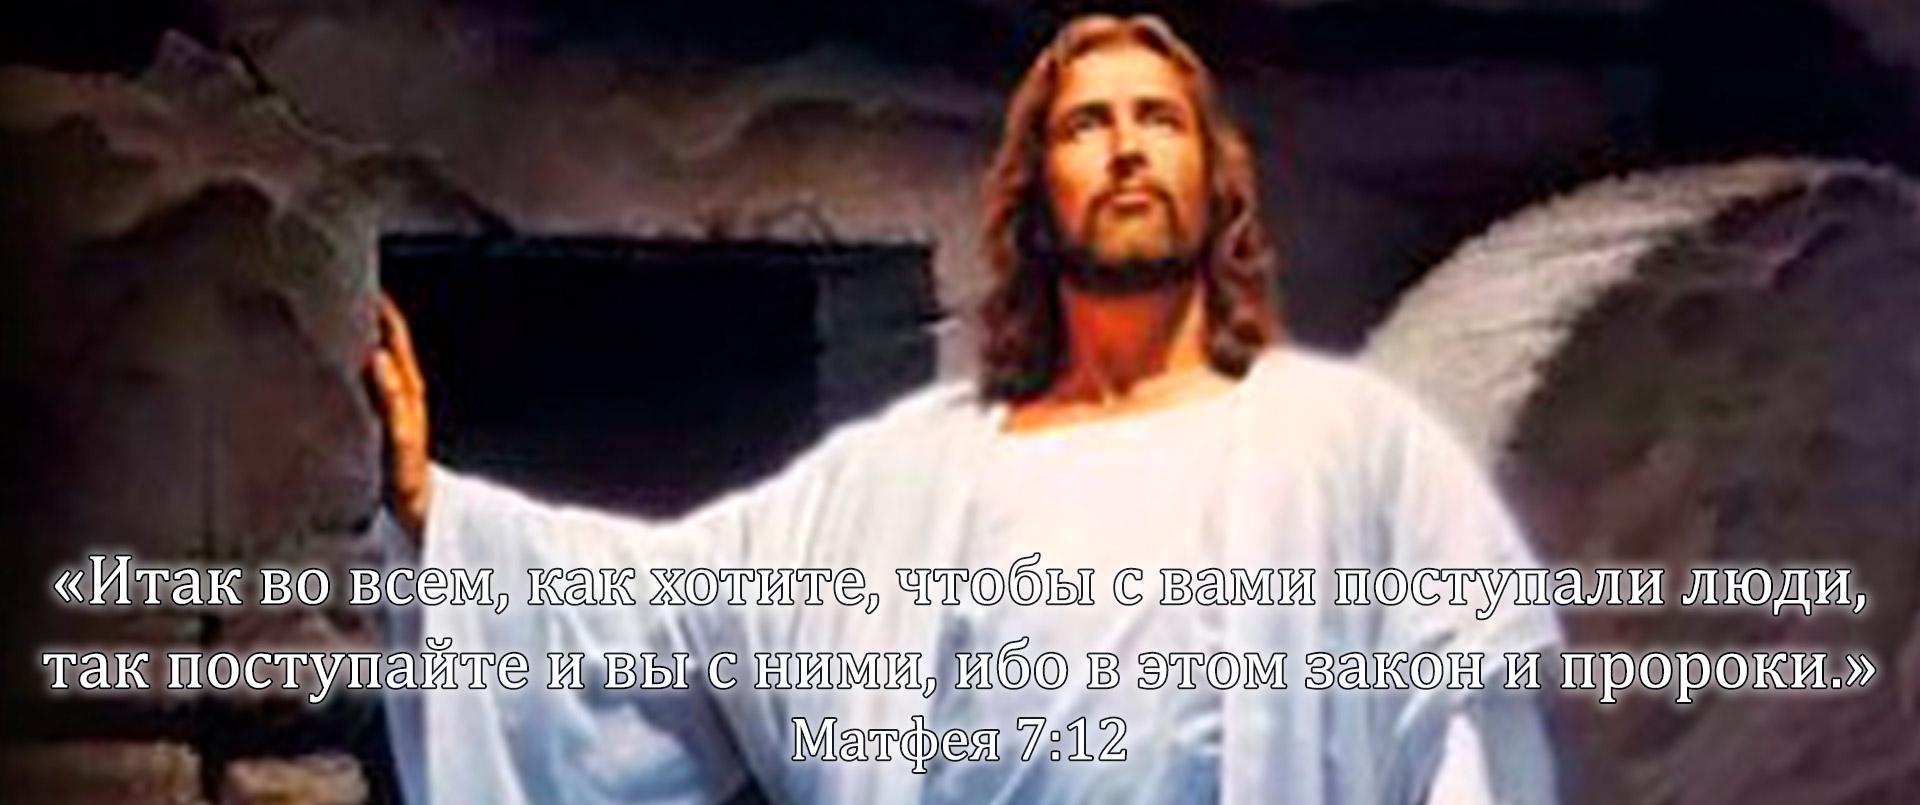 библия матвей, библия цитаты, цитаты из библии, библейские уроки,